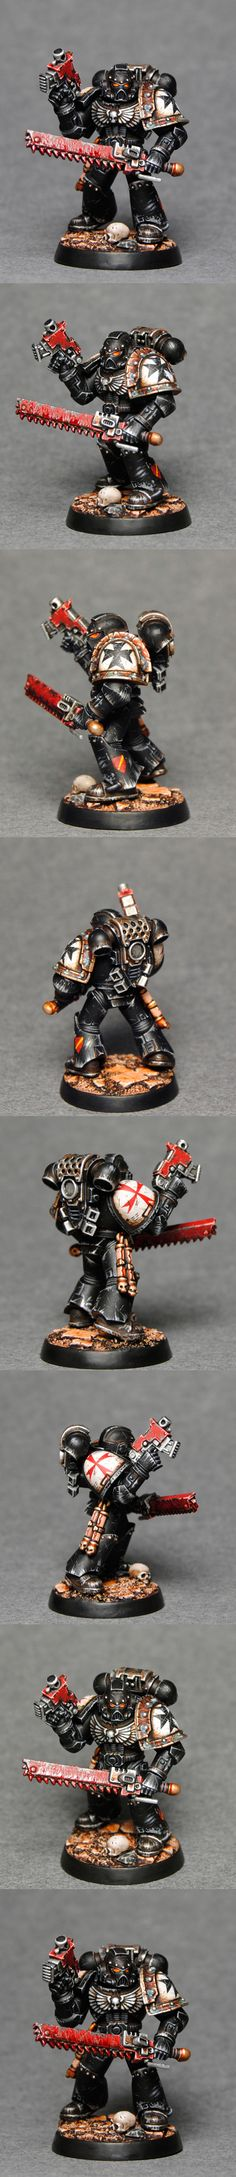 Black Templar Crusader - Totem Pole